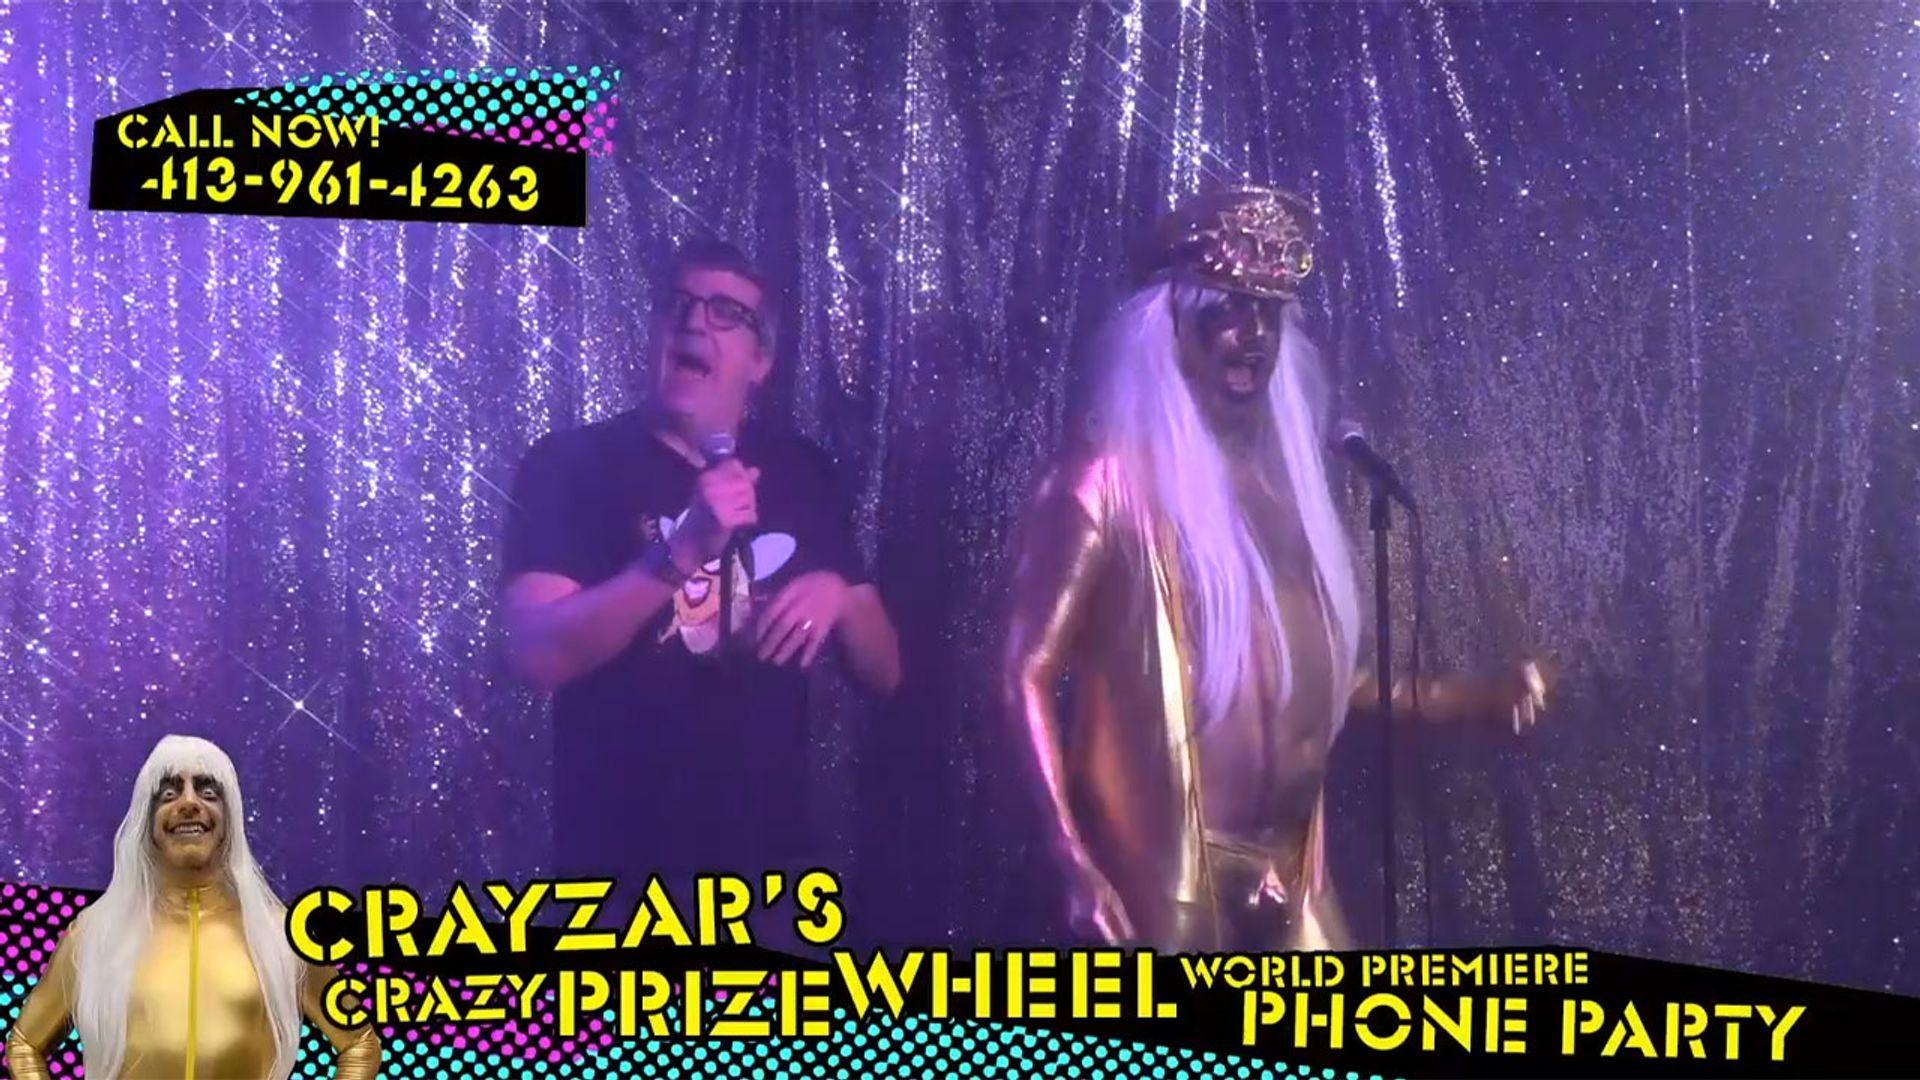 Crayzar's Crazy Prize Wheel Premiere Phone Party